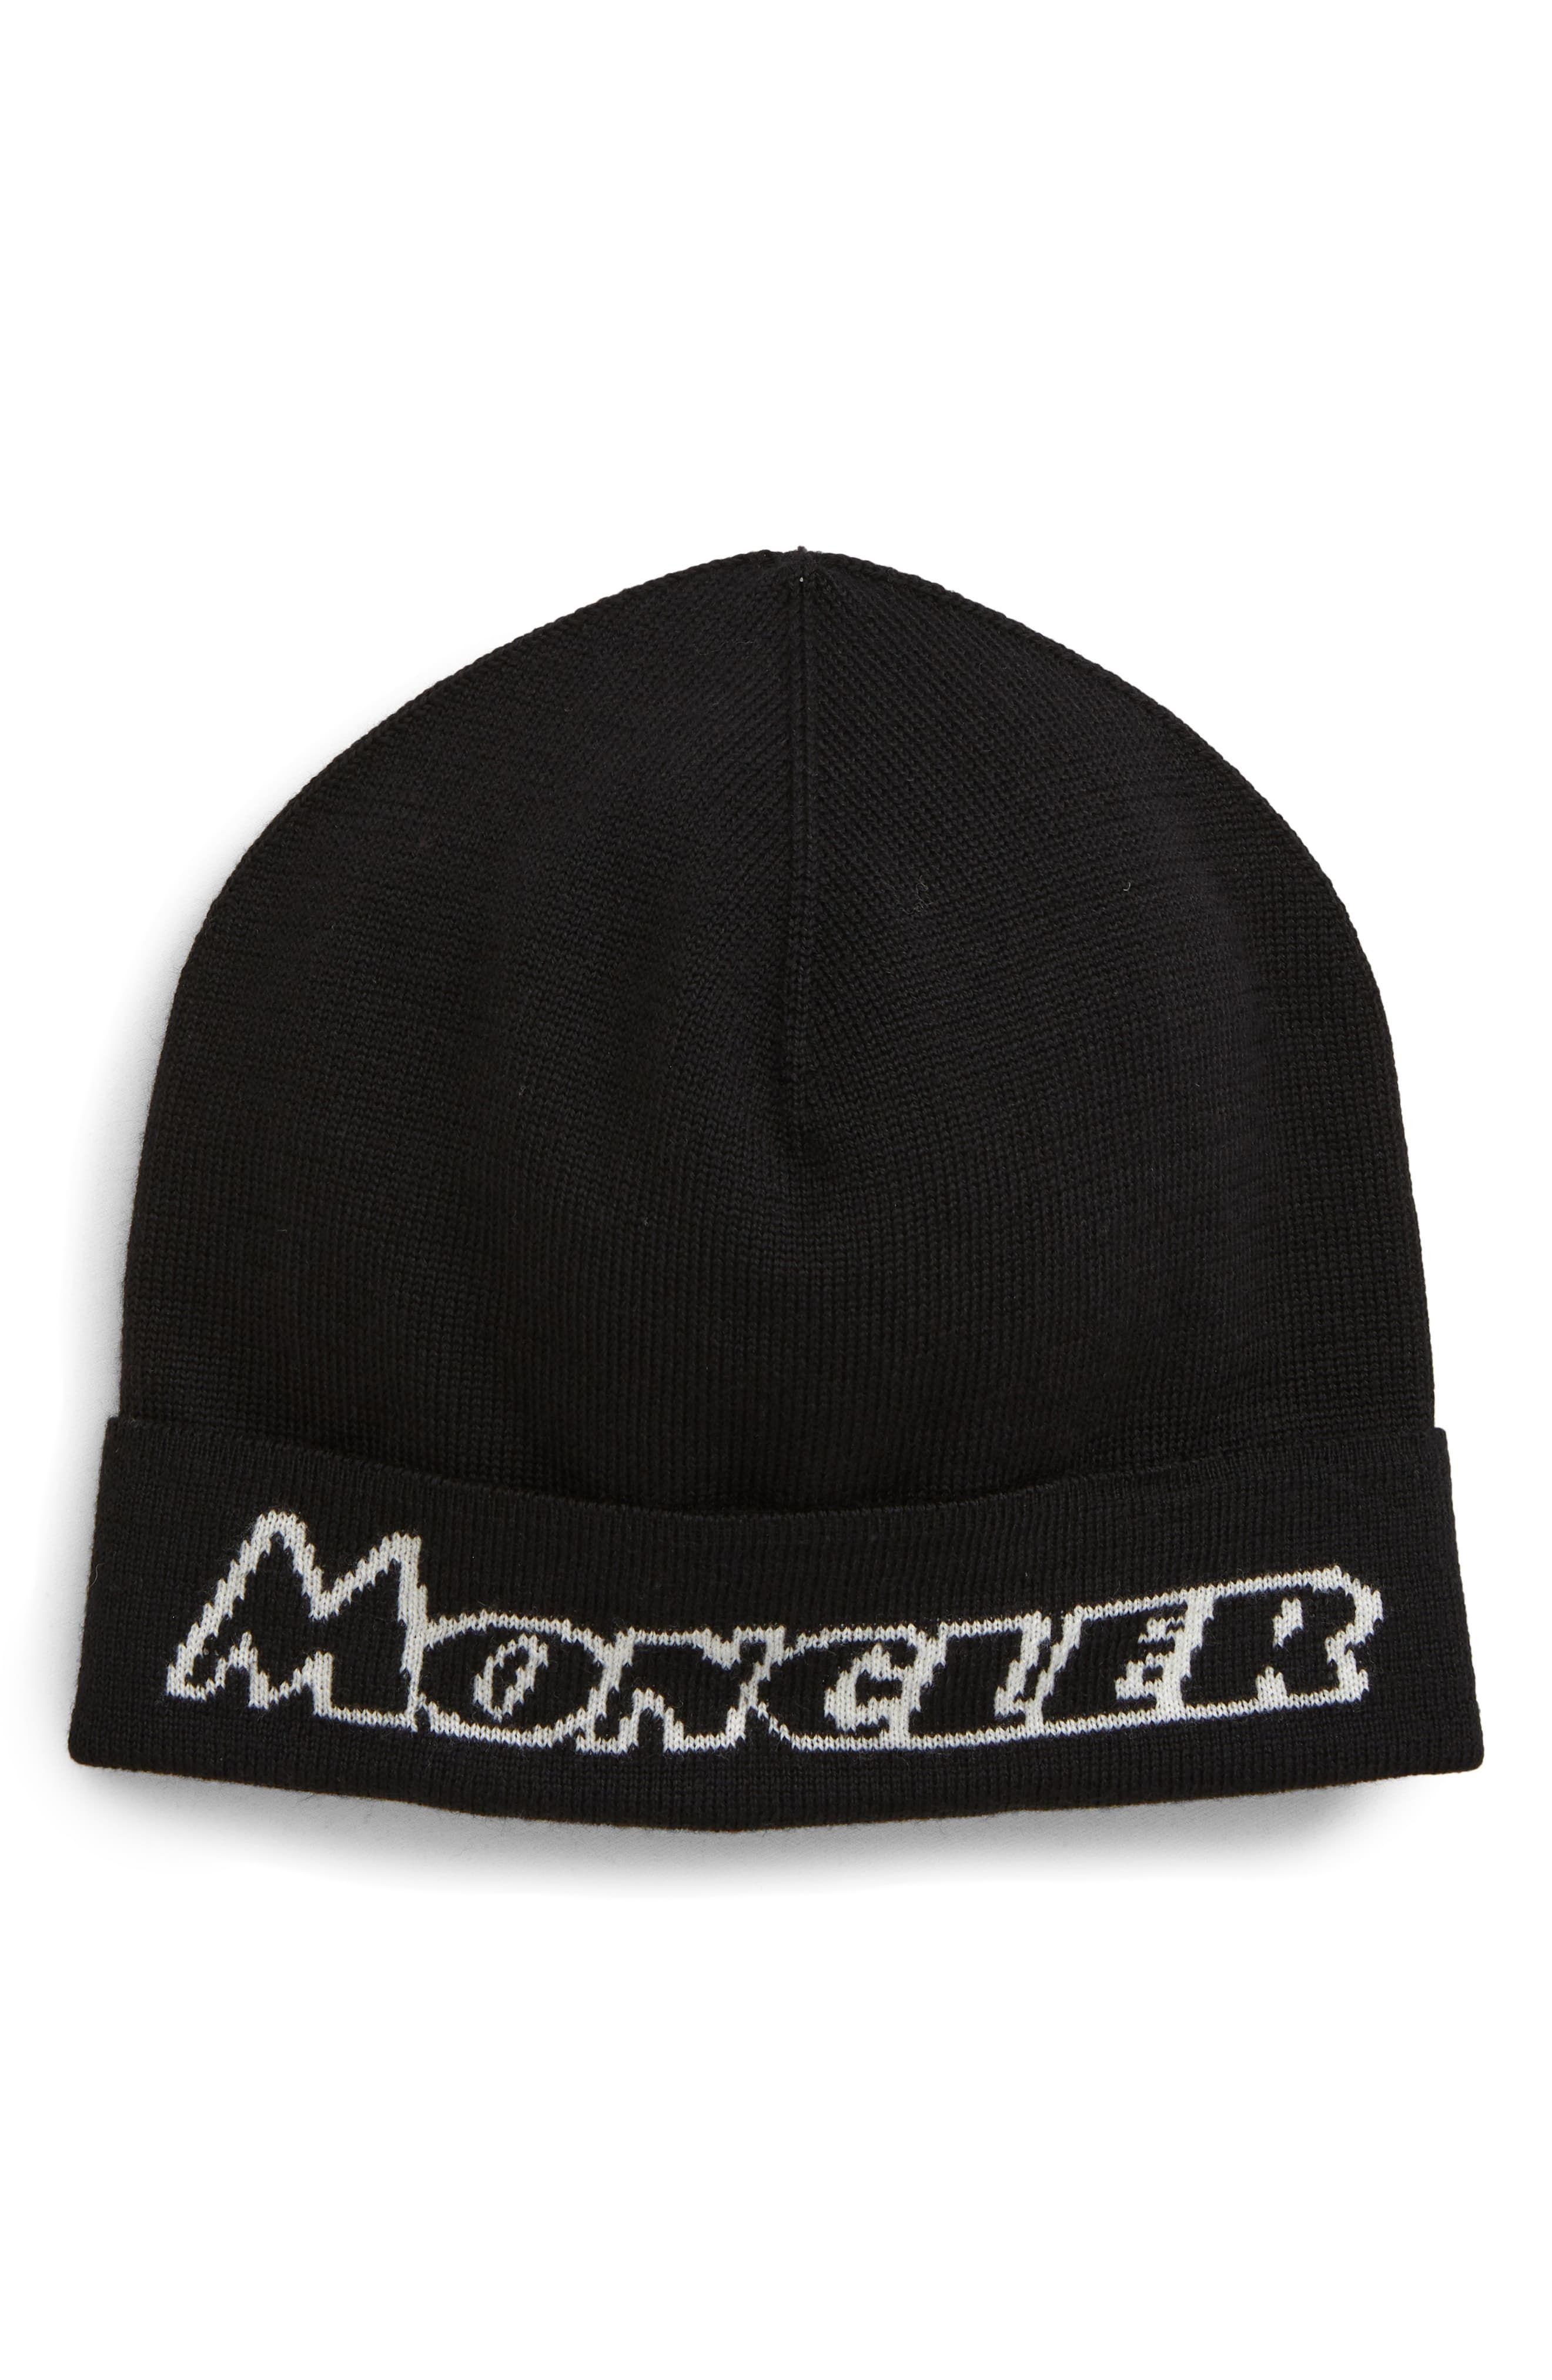 Moncler Logo Beanie Black Beanie, Moncler, Nordstrom